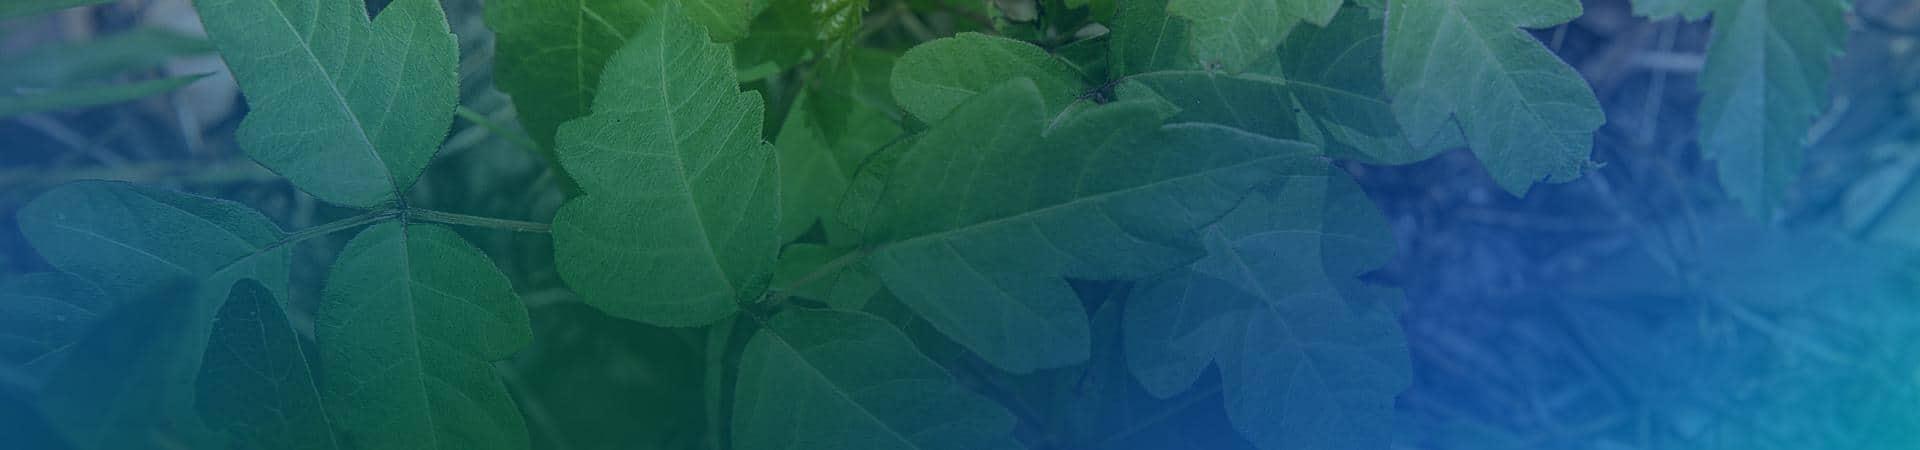 poison ivy in new york